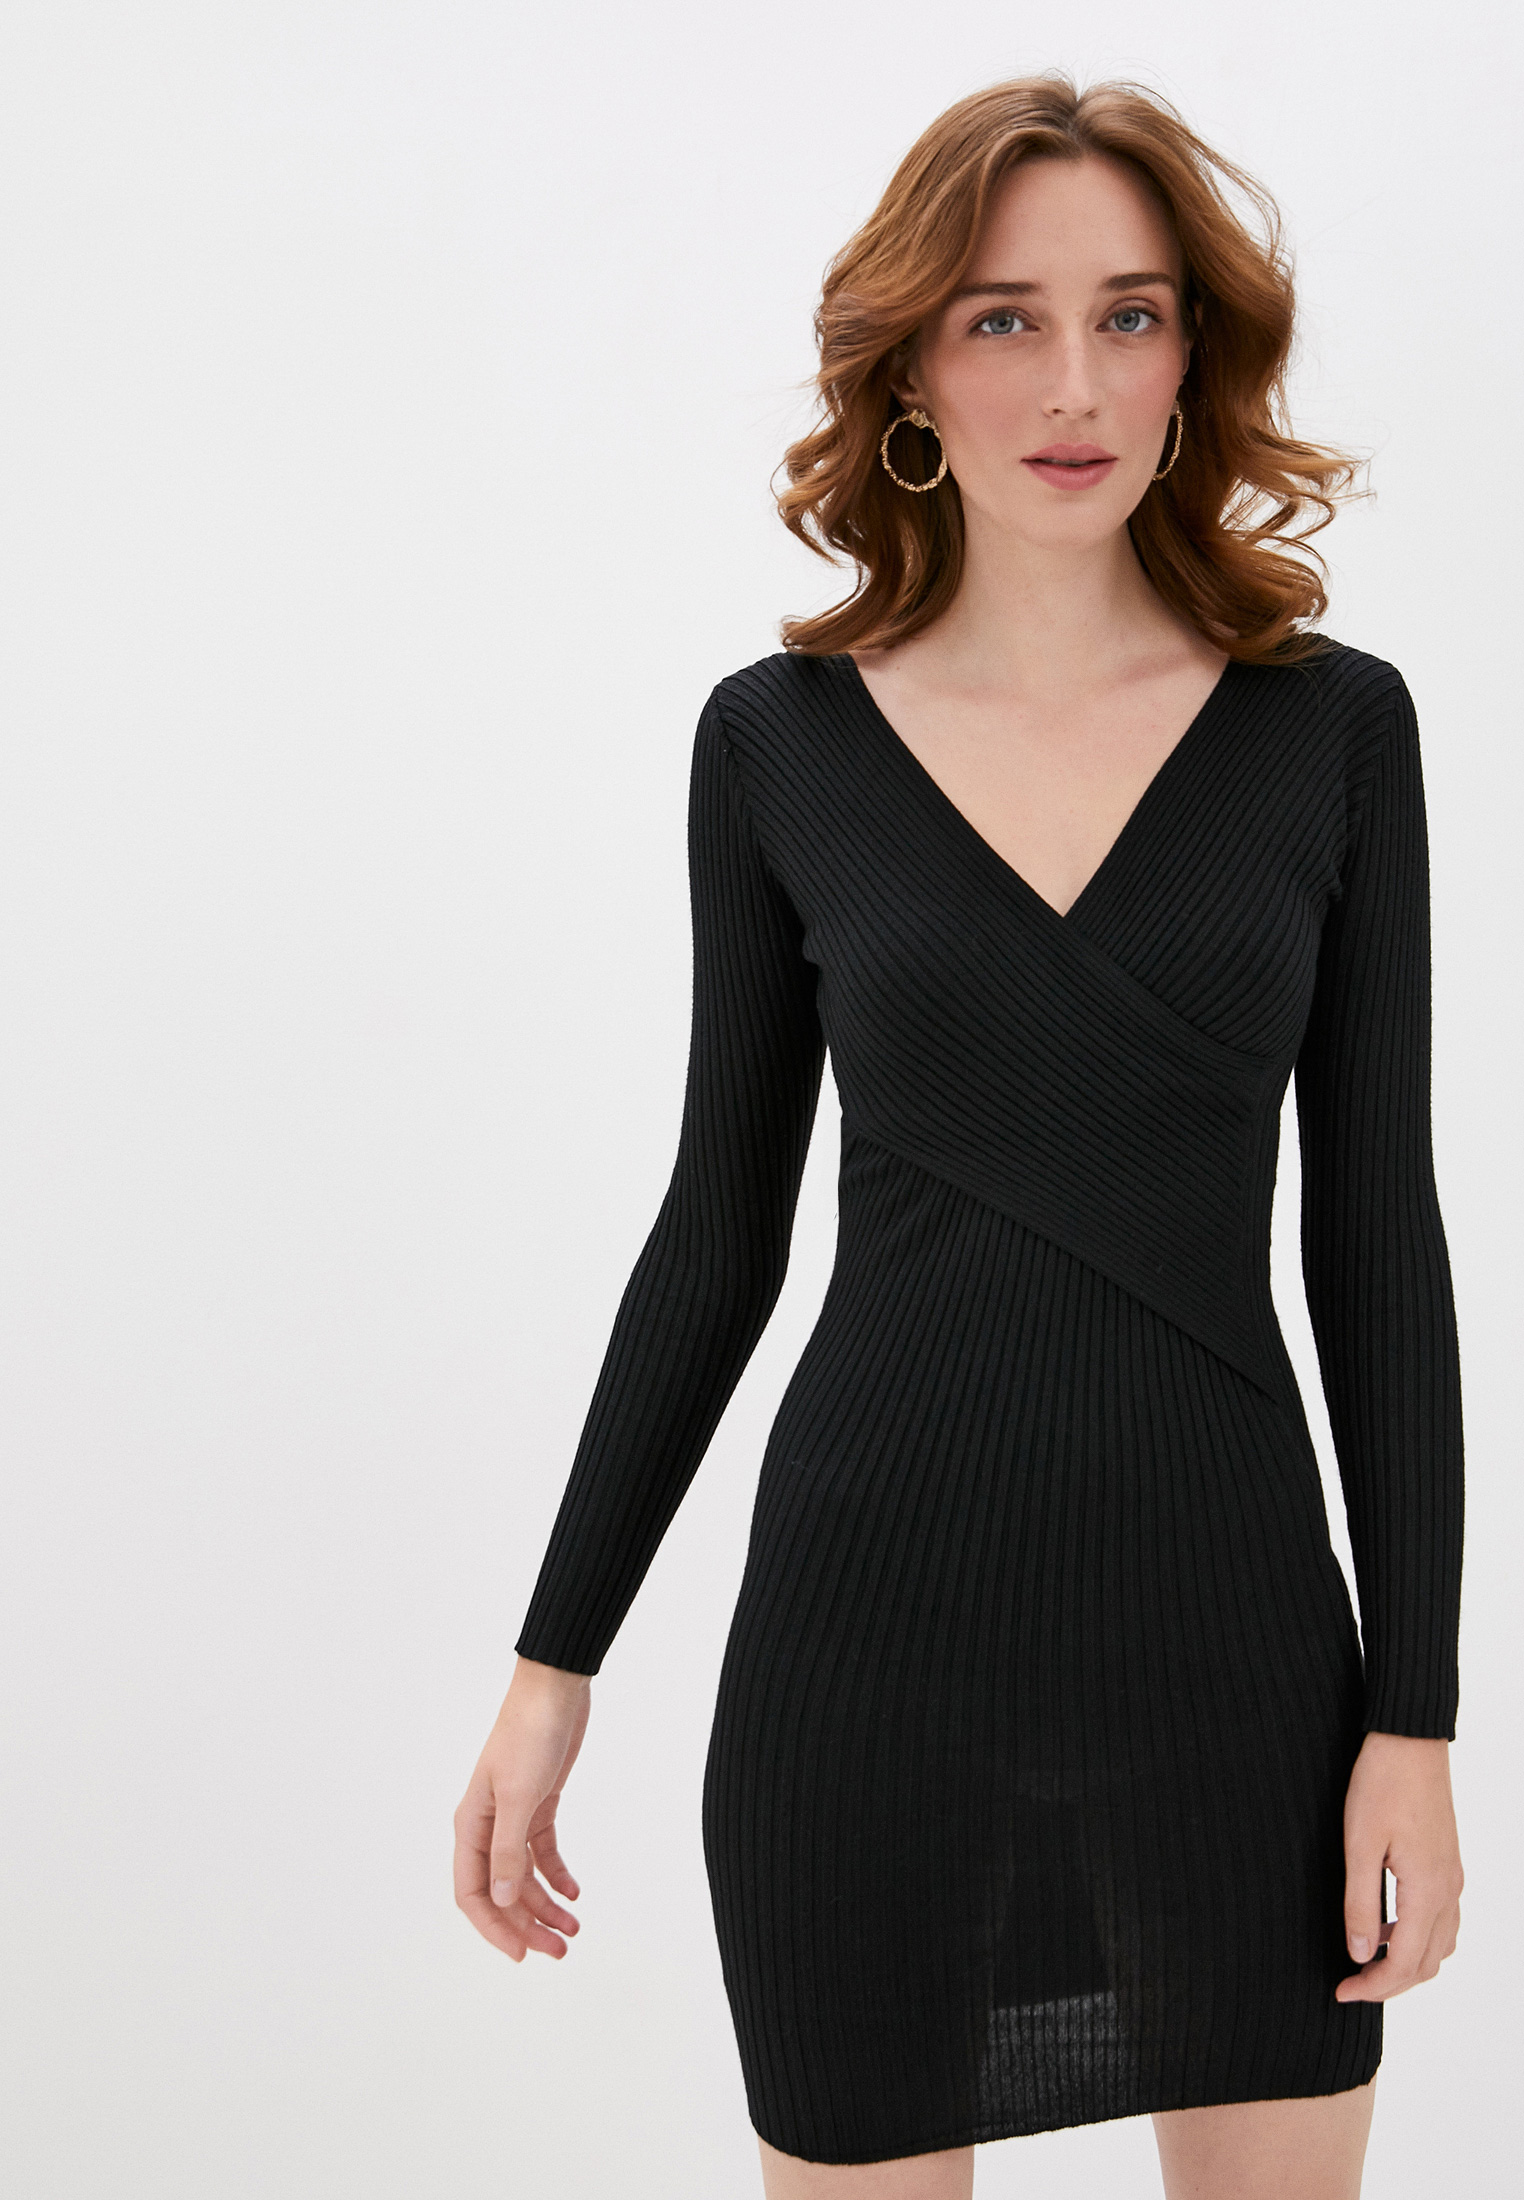 Вязаное платье Miss Gabby 8143